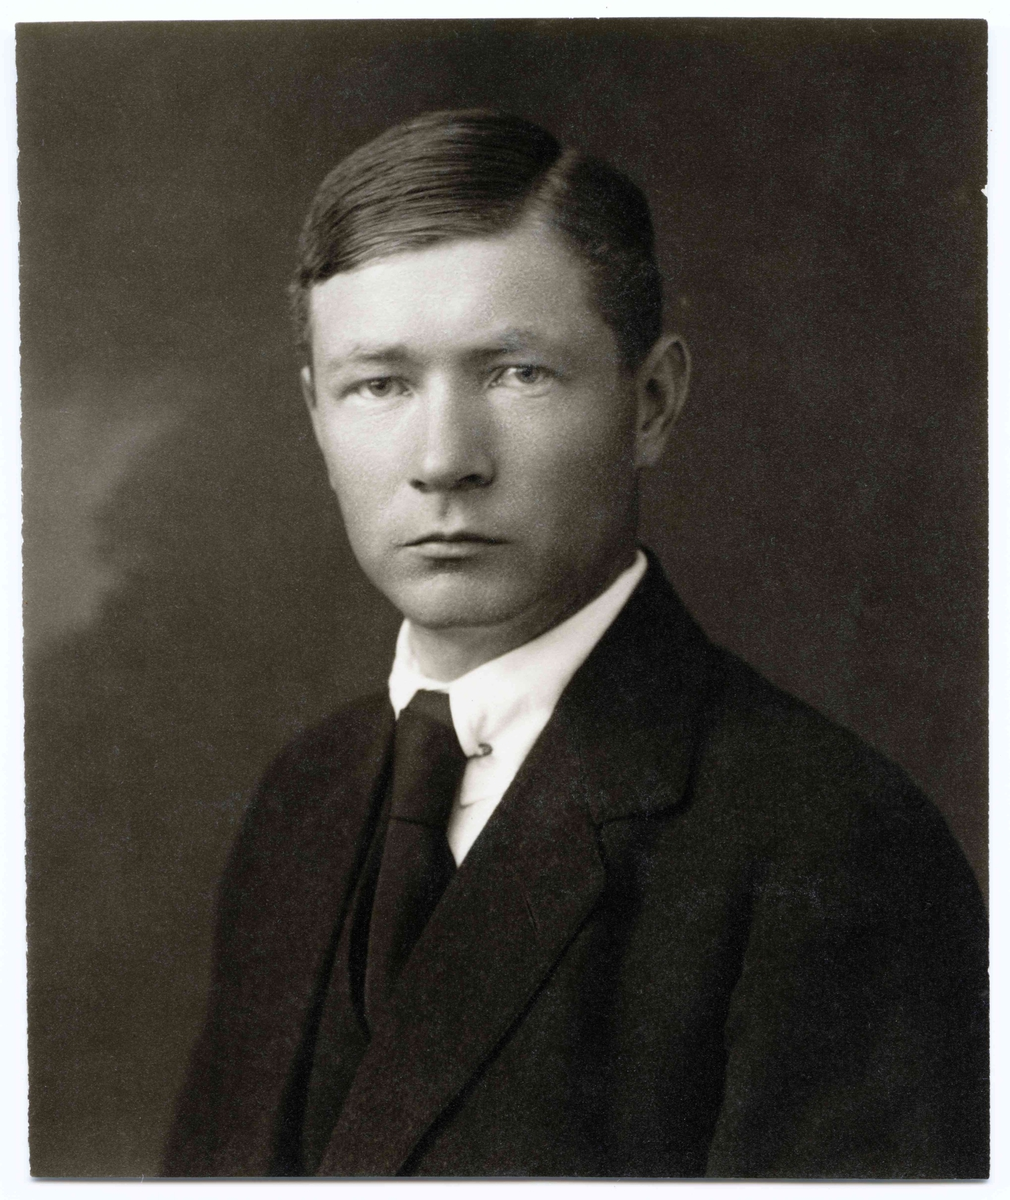 Almqvist, Osvald (1884 - 1950)